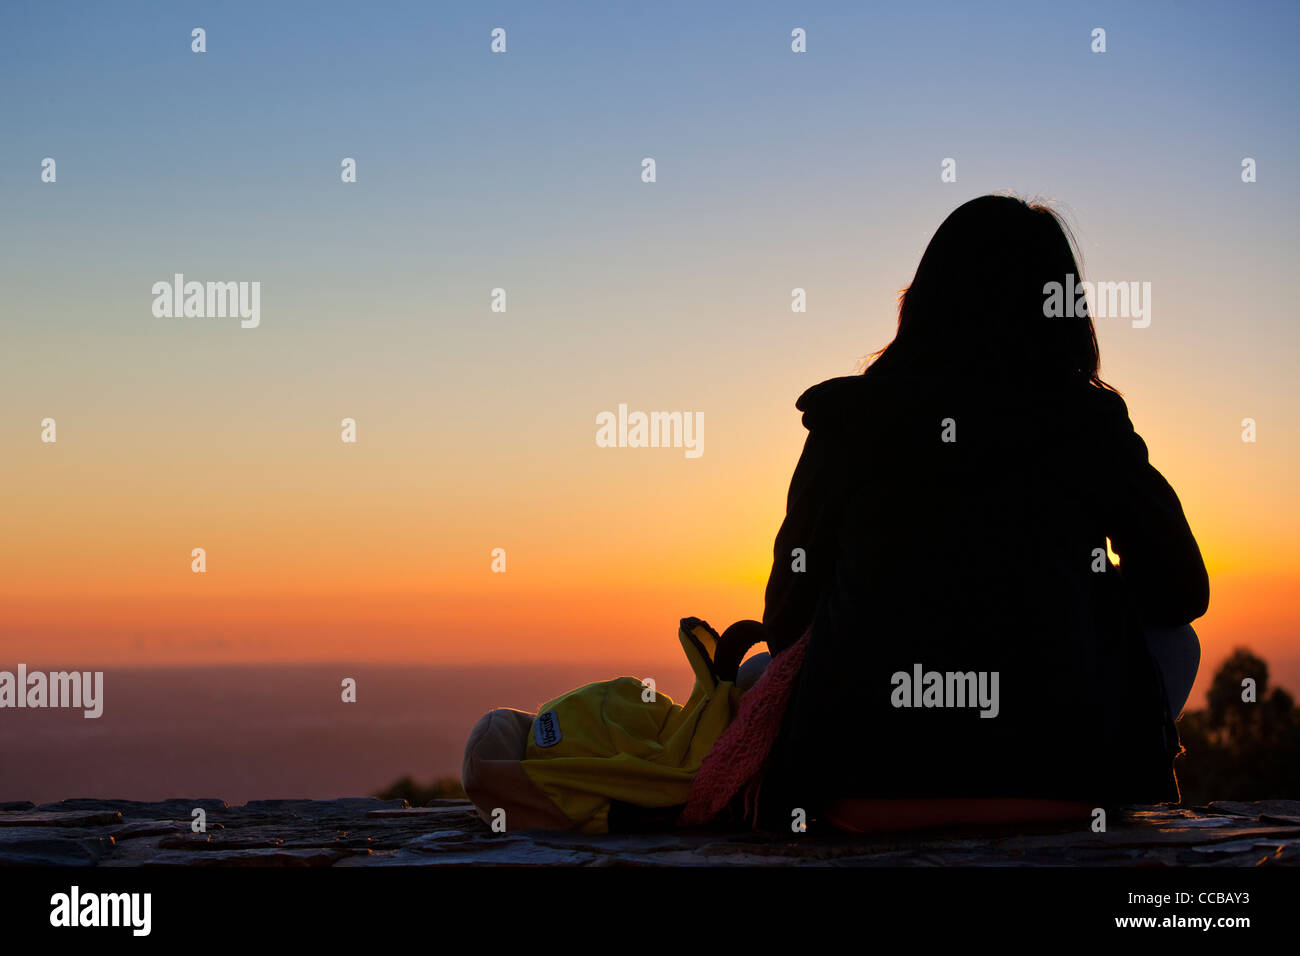 woman Backpacker sunset sunrise silhouette view Australia over Yarra valley from skyhigh platform Dandenong ranges - Stock Image